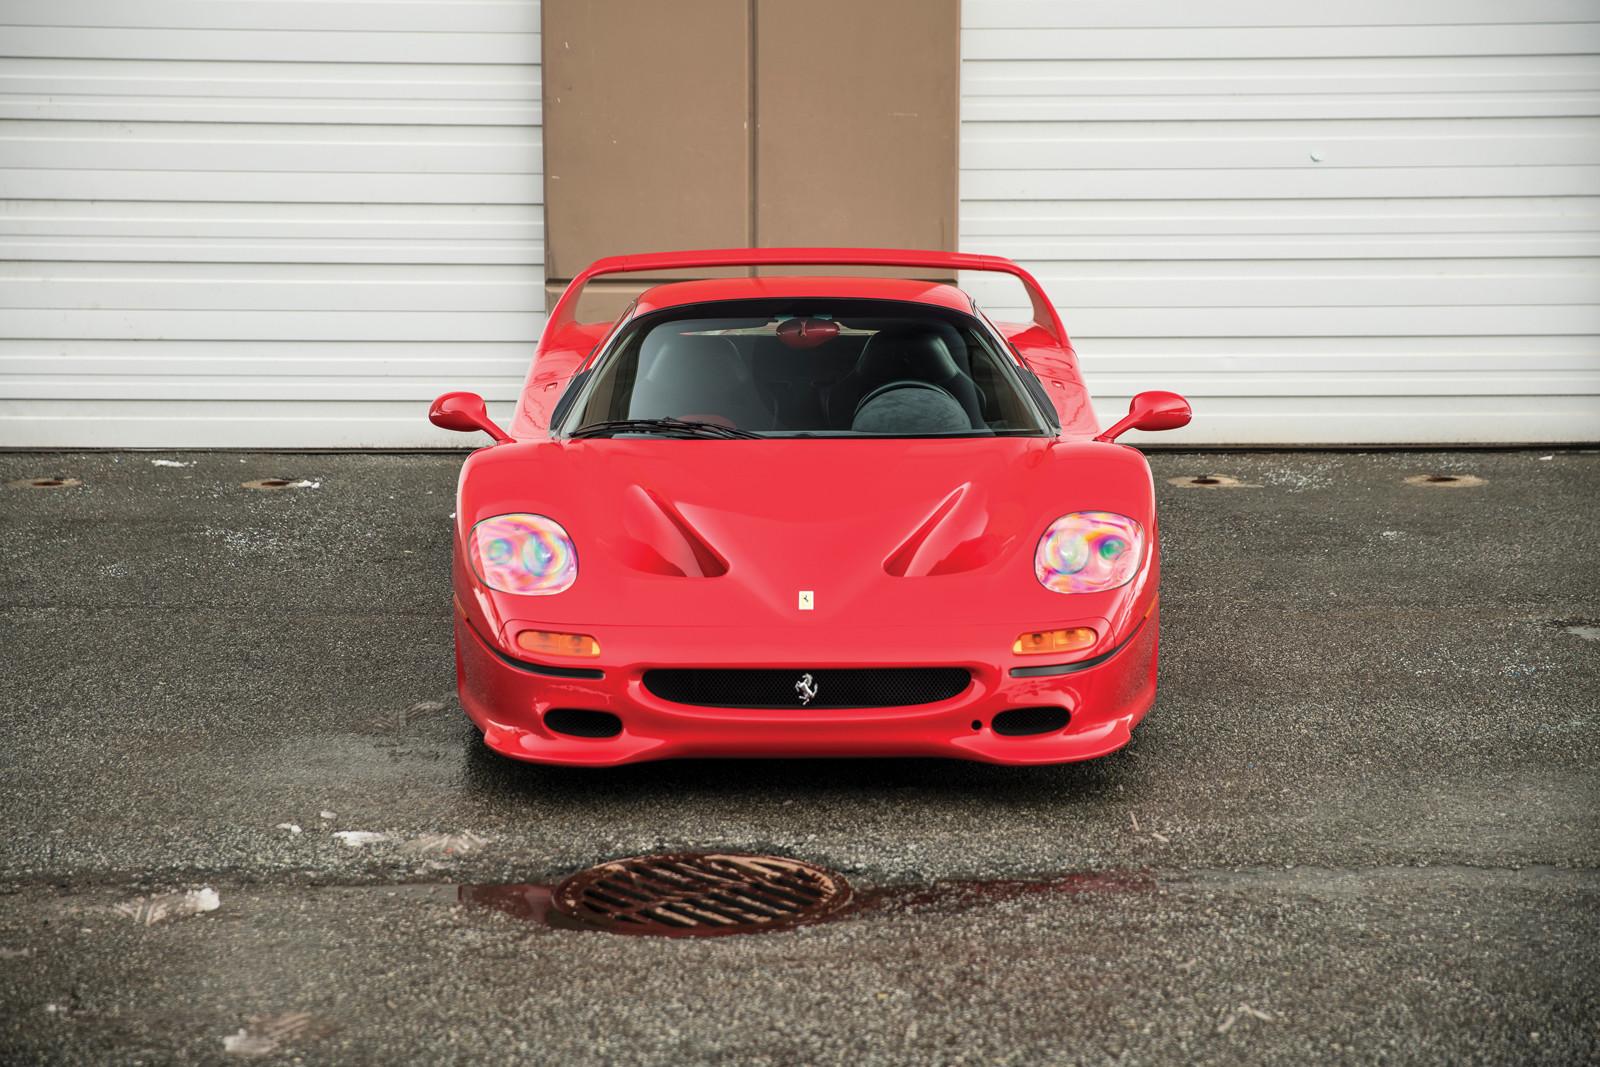 Mike Tyson subasta su Ferrari F50 - Pela los bitcoin papu!